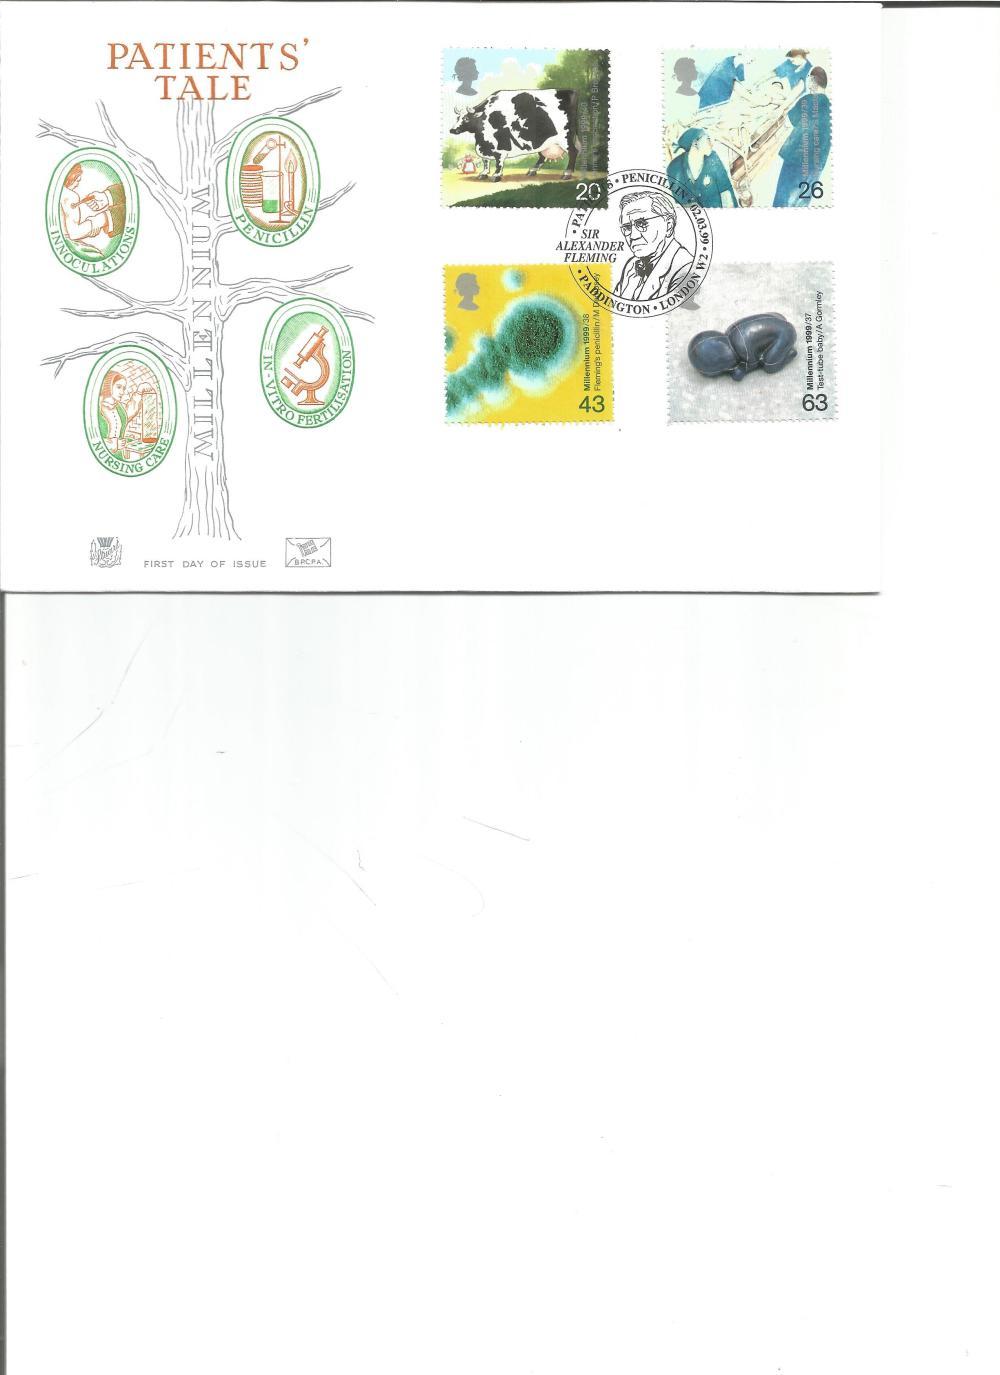 FDC Patients Tale c/w set of four stamps PM Sir Alexander Fleming Patients Penicillin 02. 03. 99